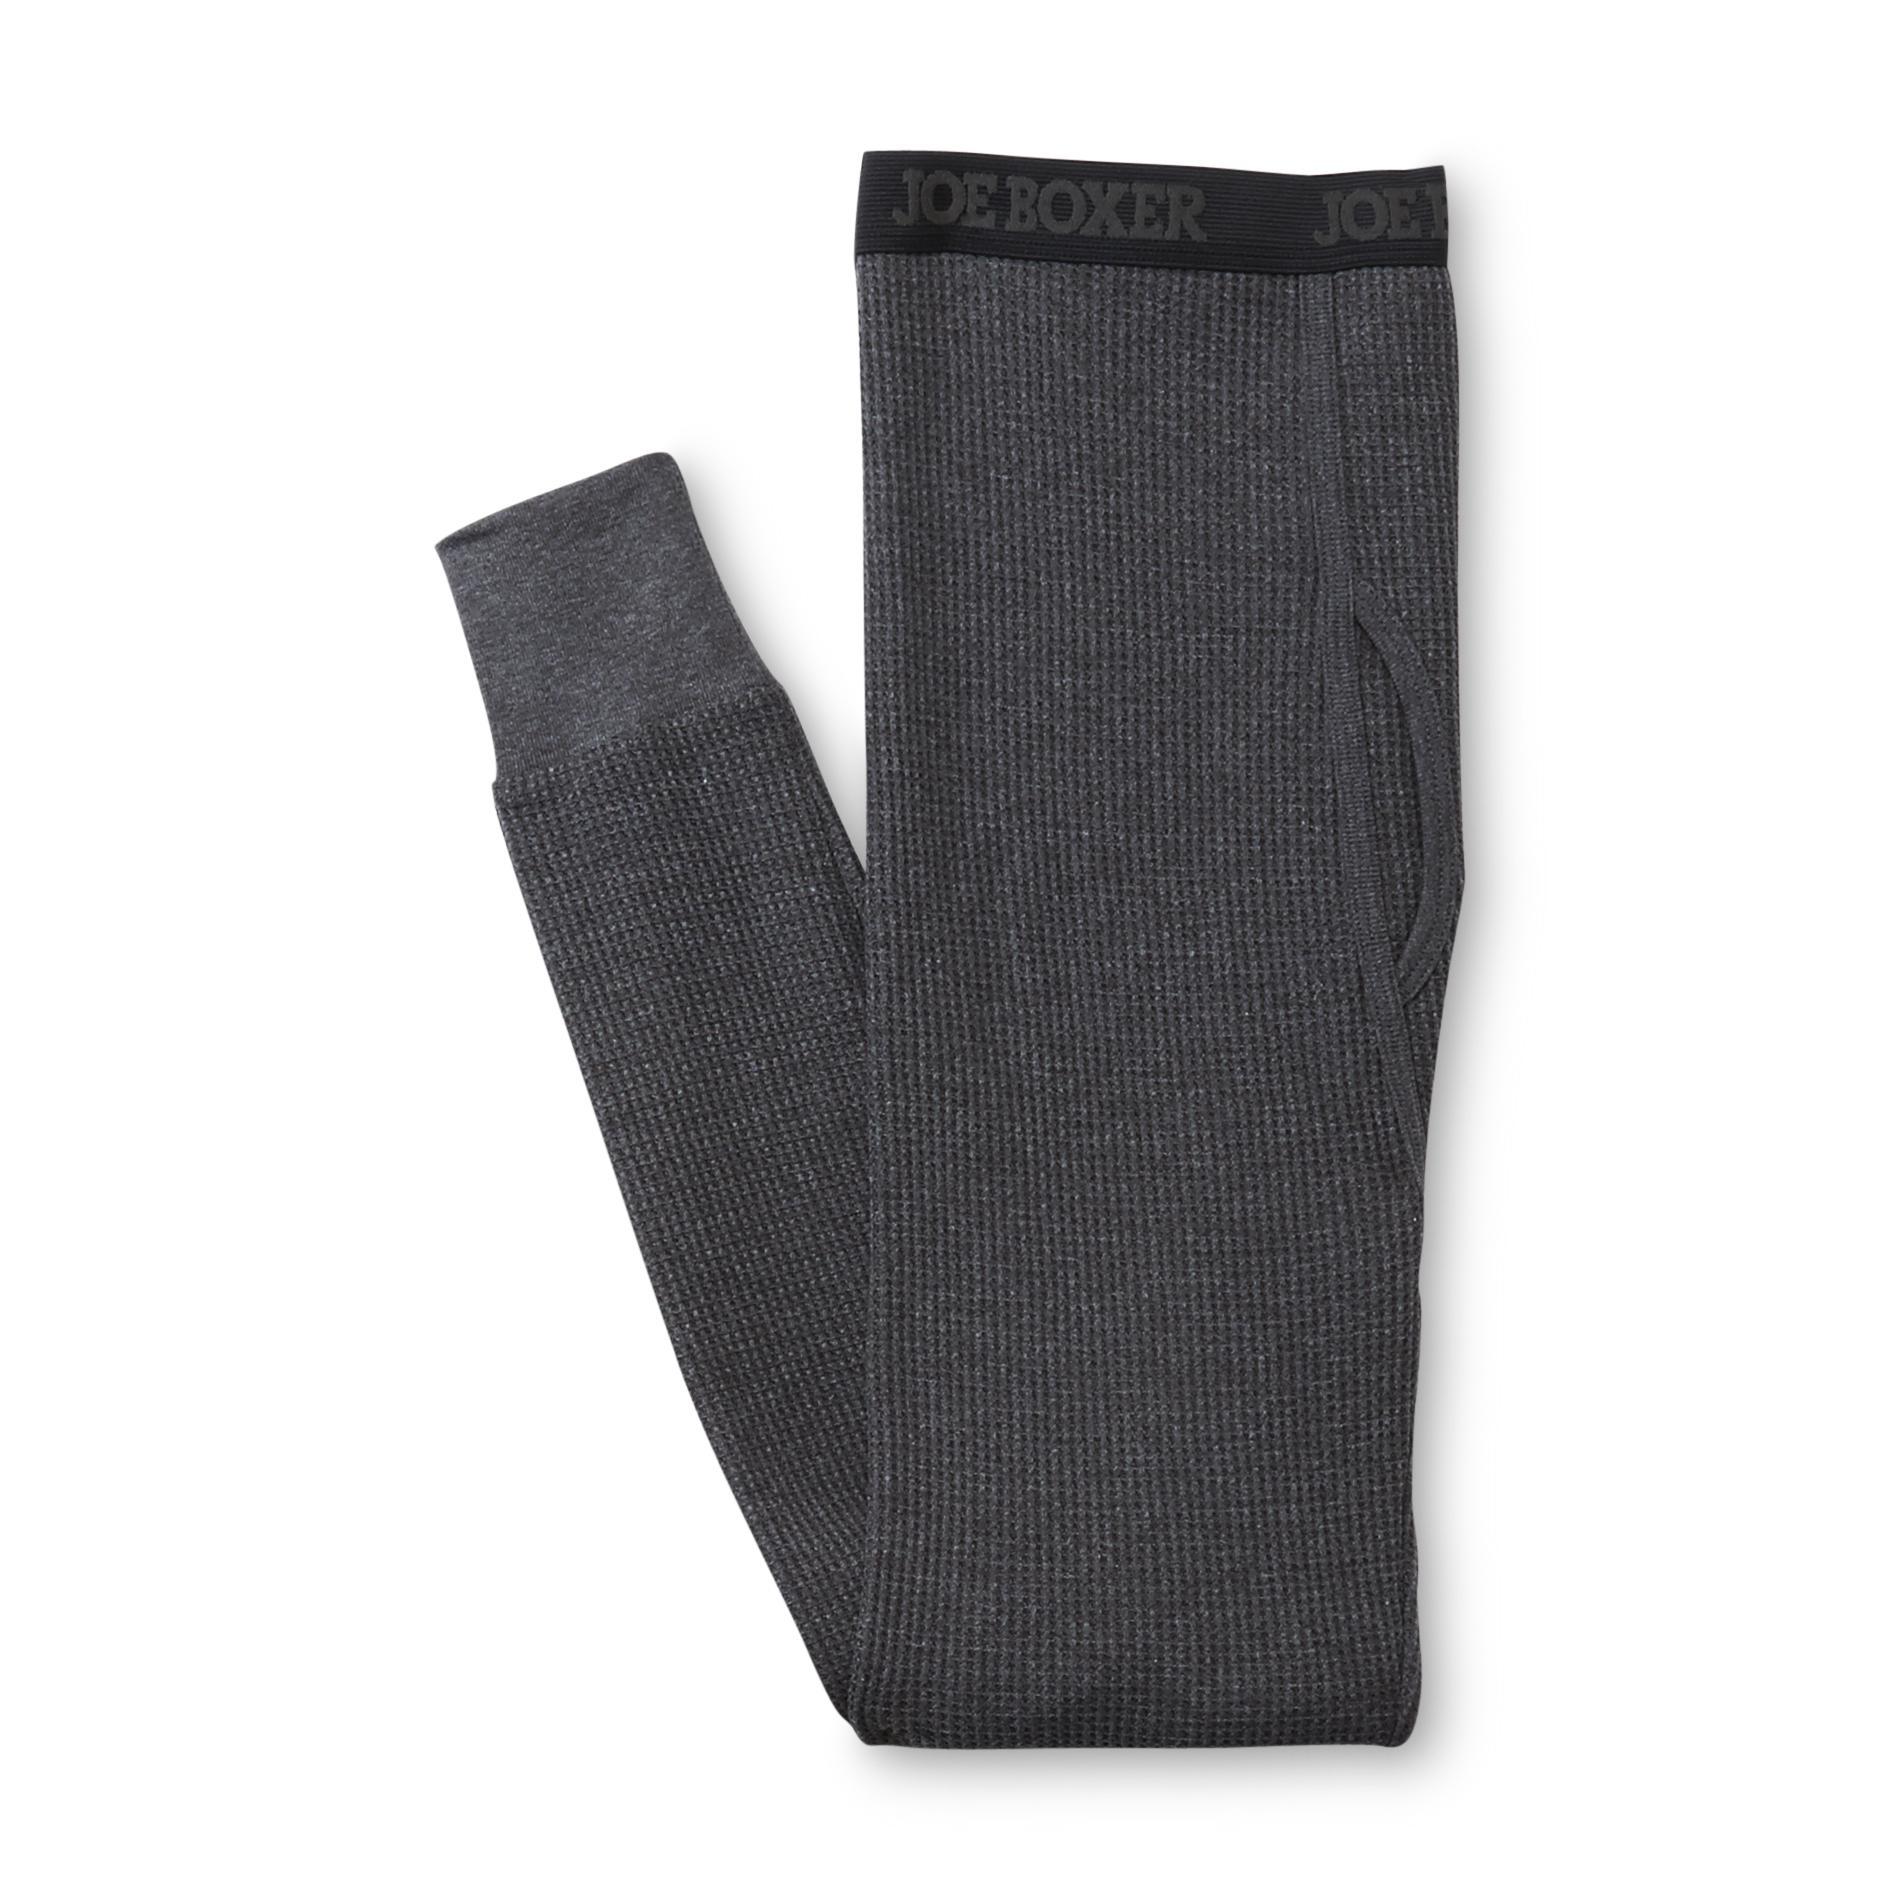 Joe Boxer Men' Thermal Long Underwear Pants - Clothing Shoes & Jewelry